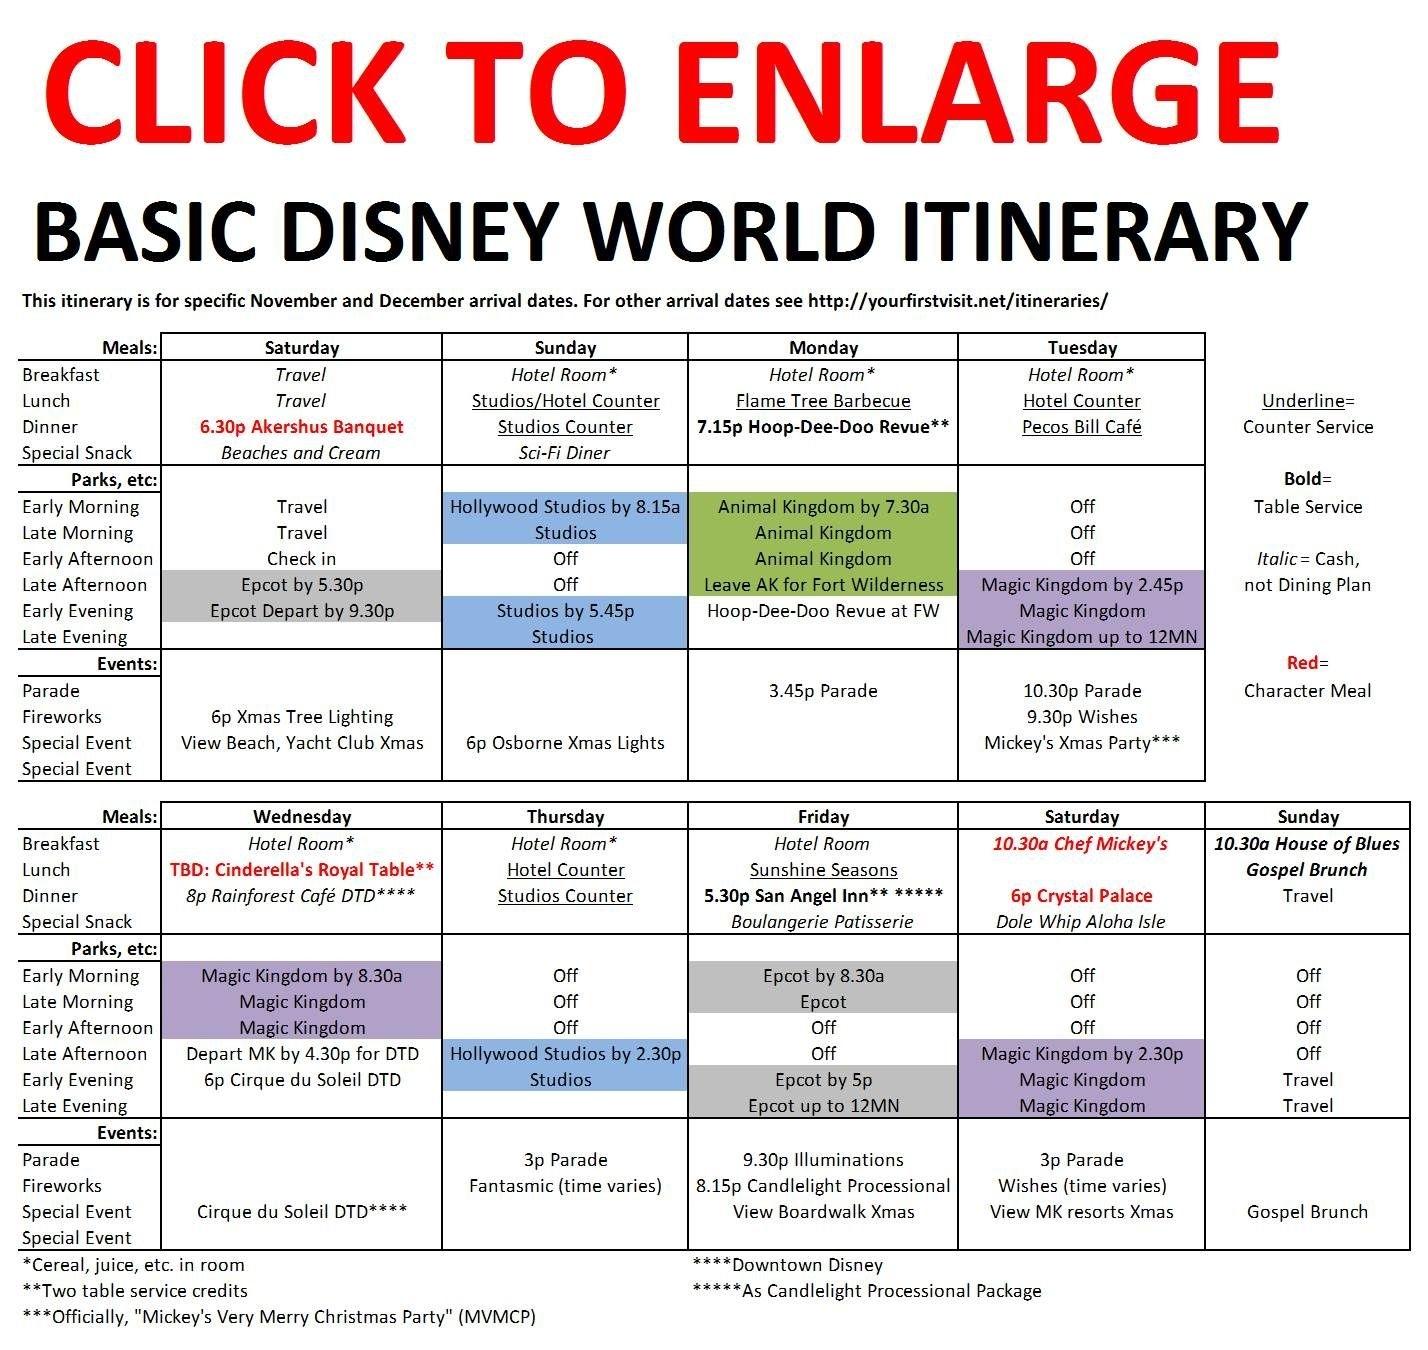 Basic 2019 December Disney World Itinerary | Disney Vacation with Disney World Itinerary Template Download 2020